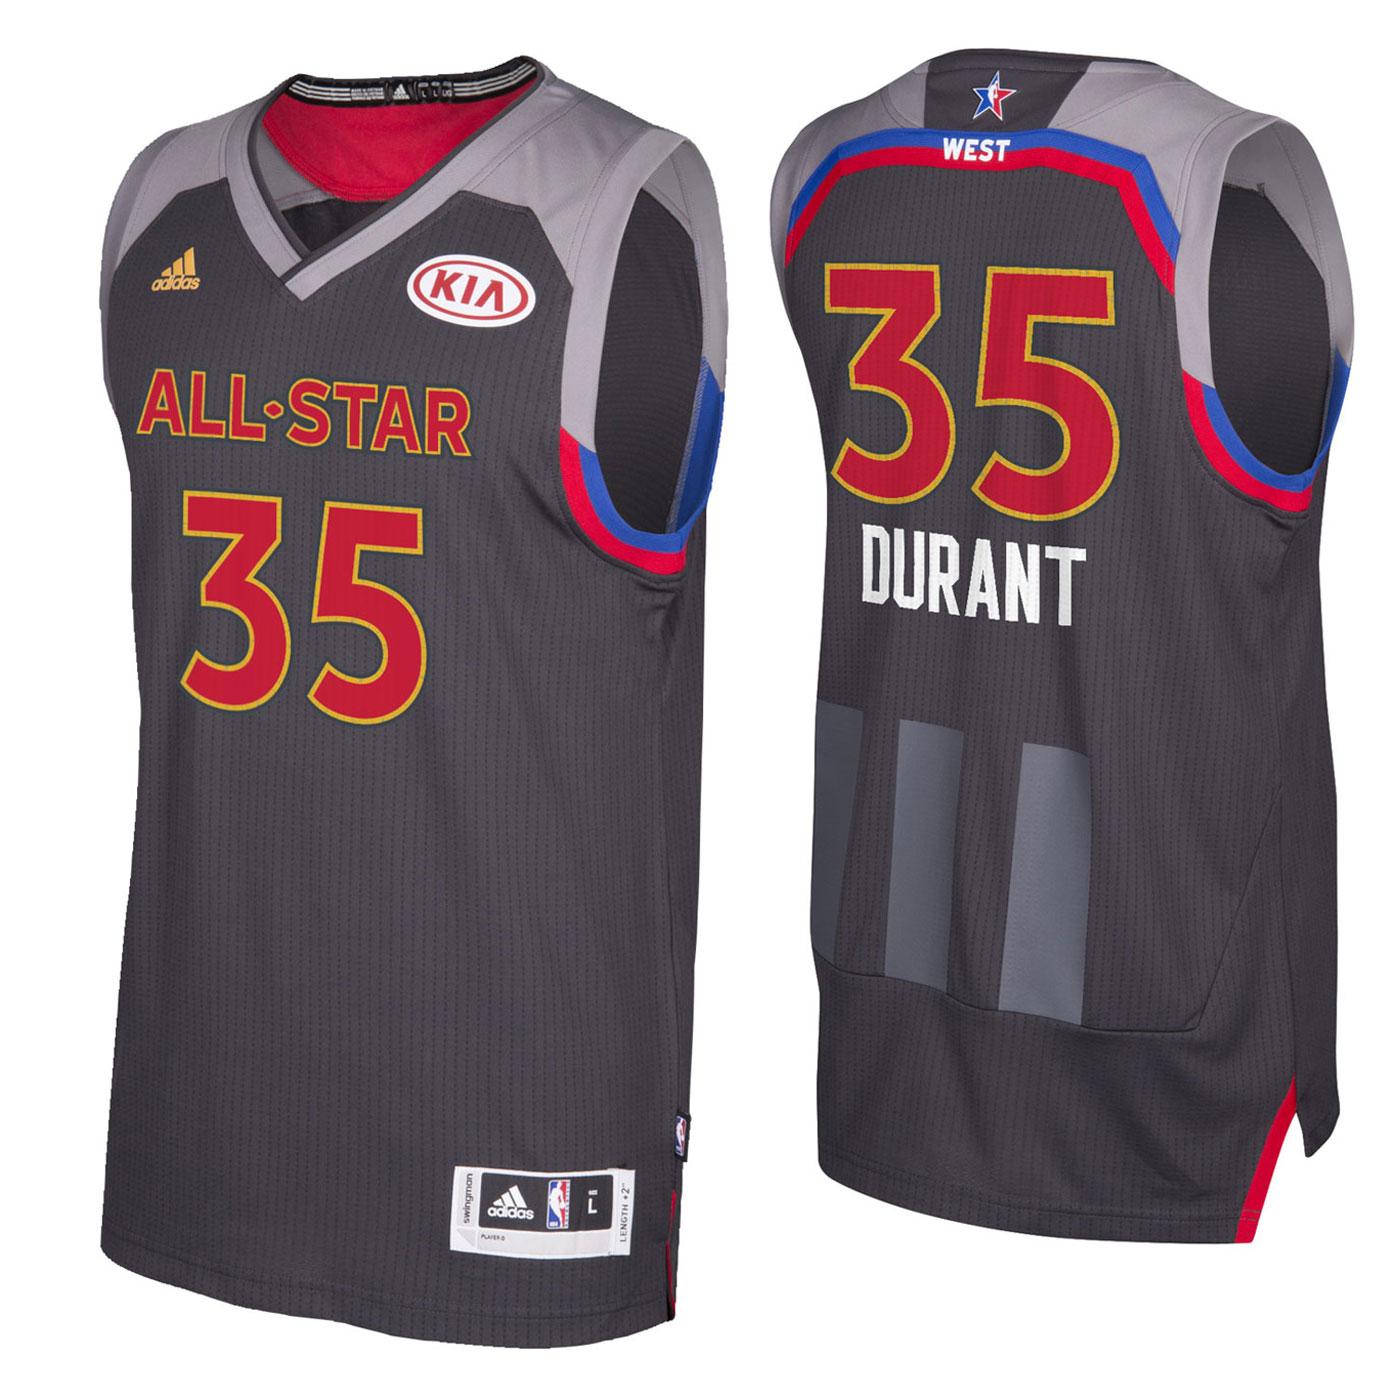 on sale fb8c3 3fa72 All Star NBA Western Kevin Durant 35 Black Jersey